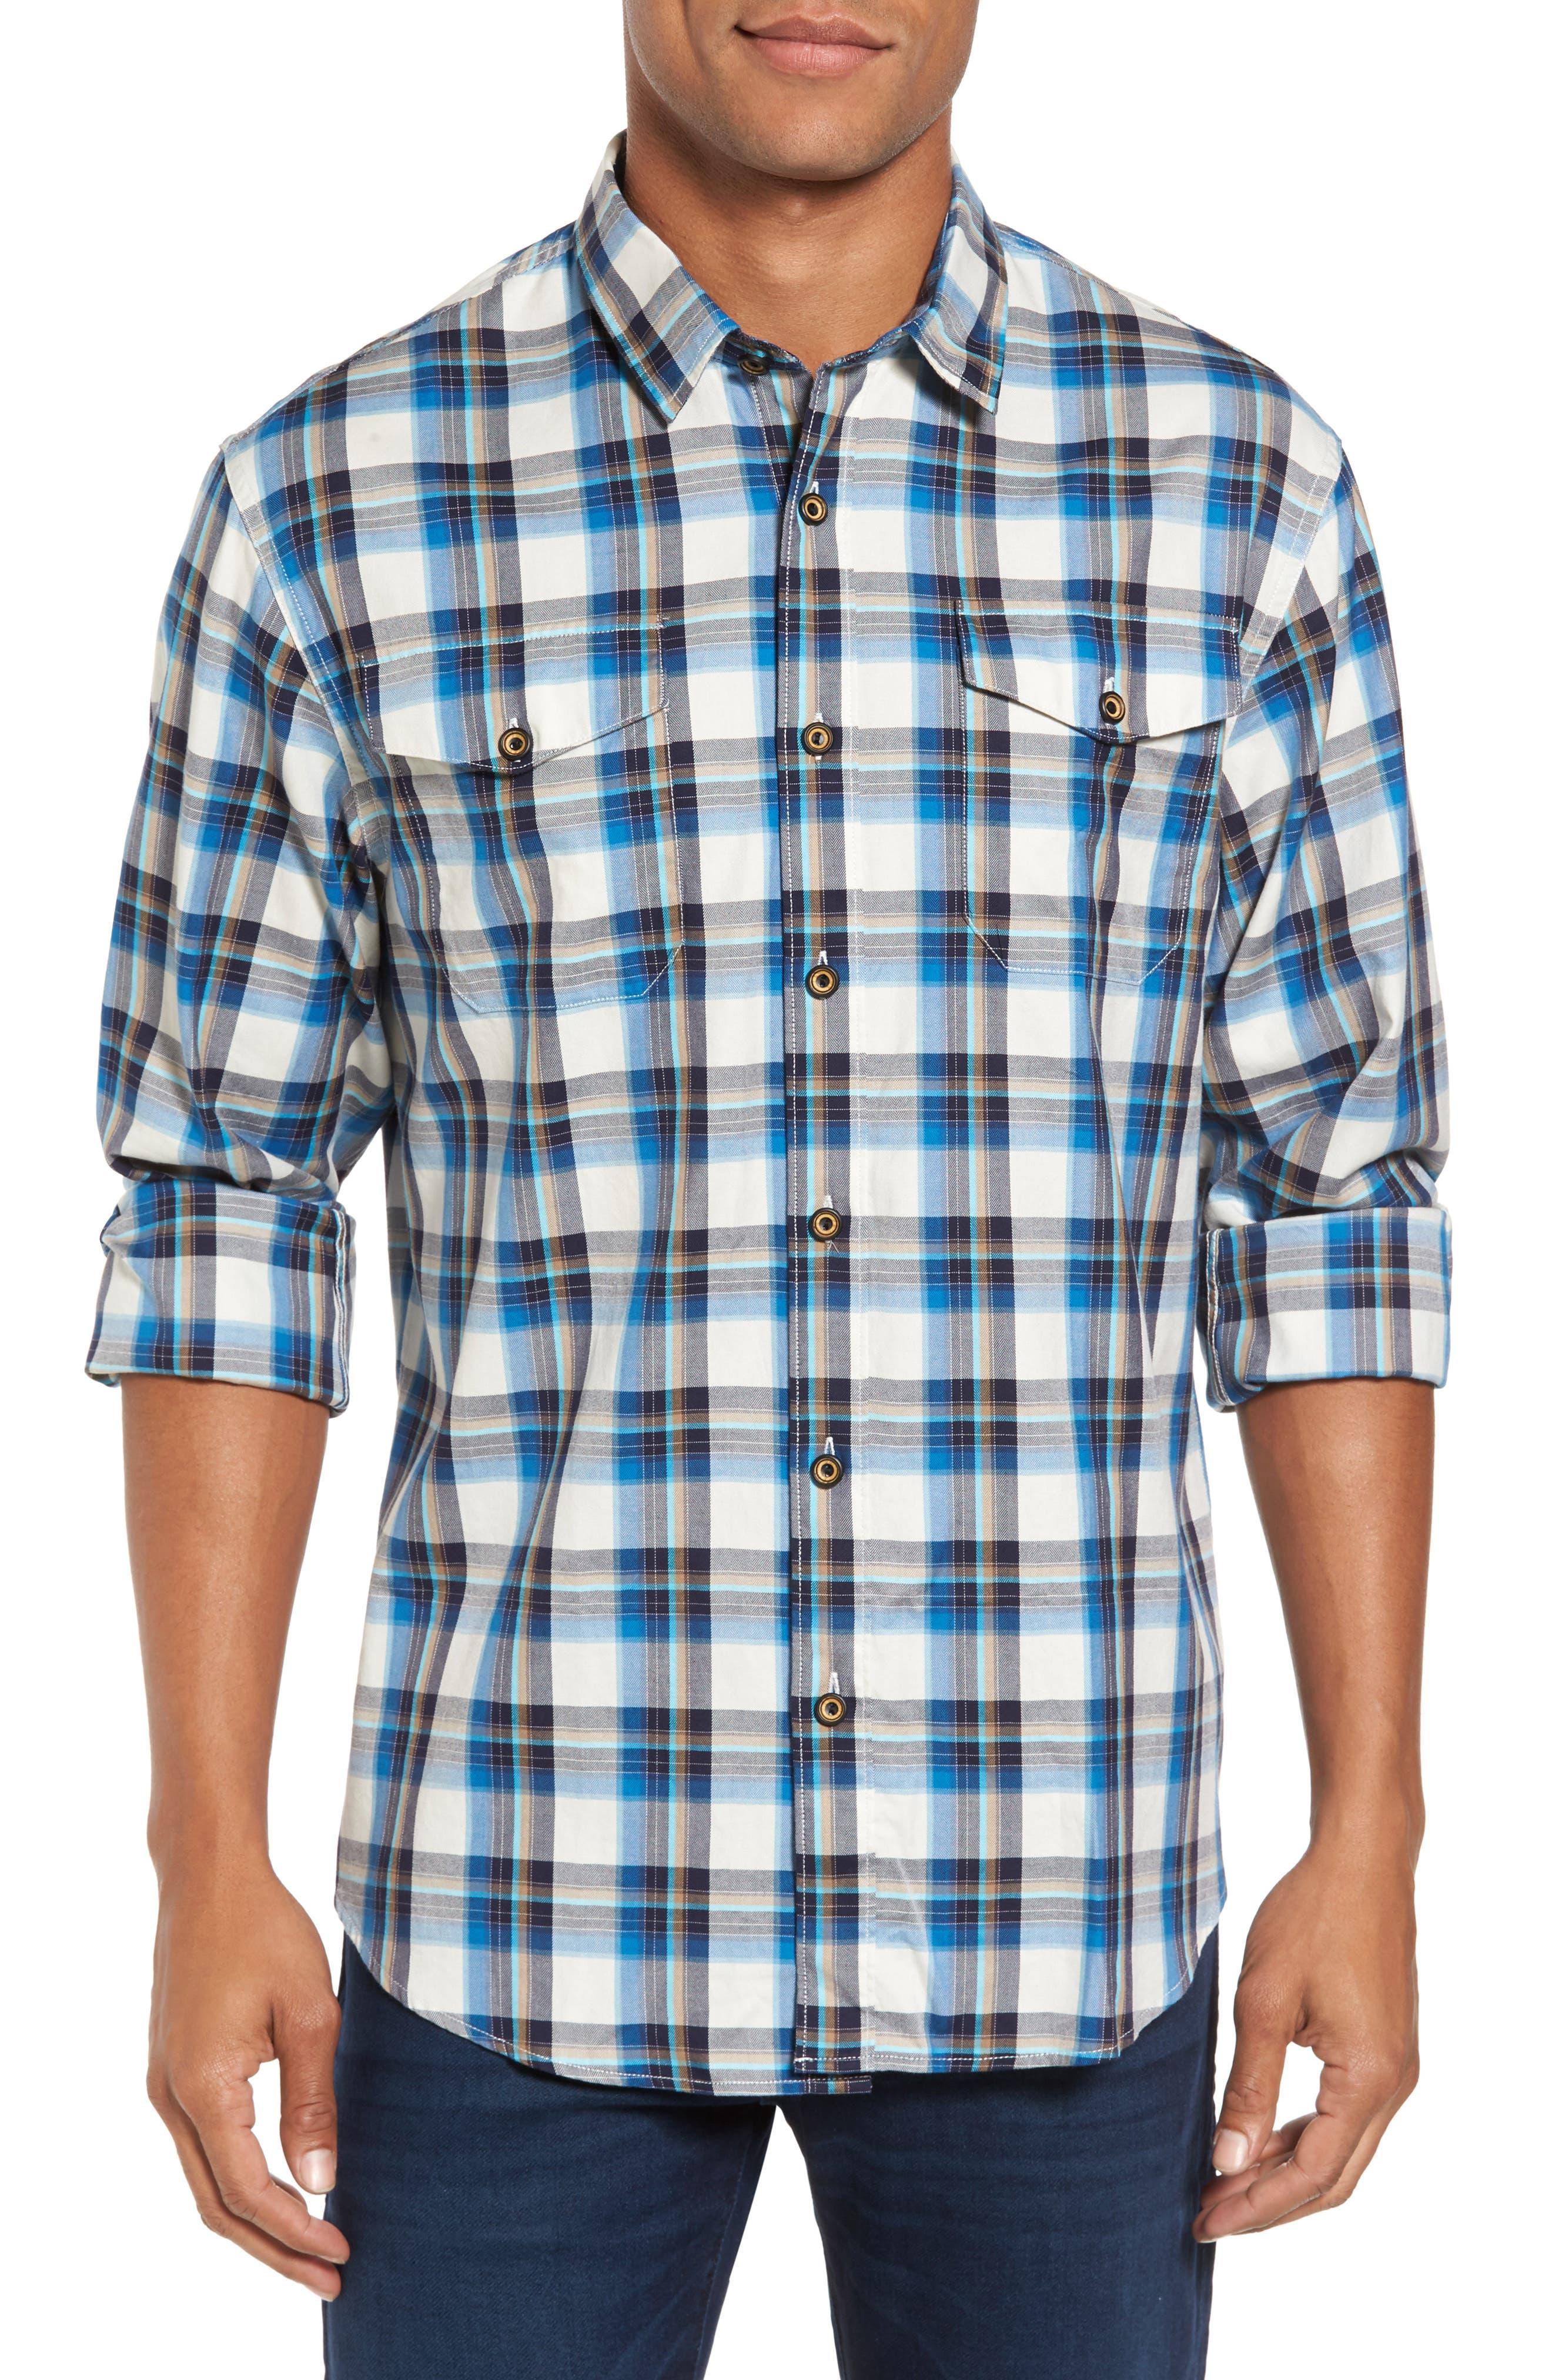 Coastaoro Seacliff Plaid Flannel Shirt